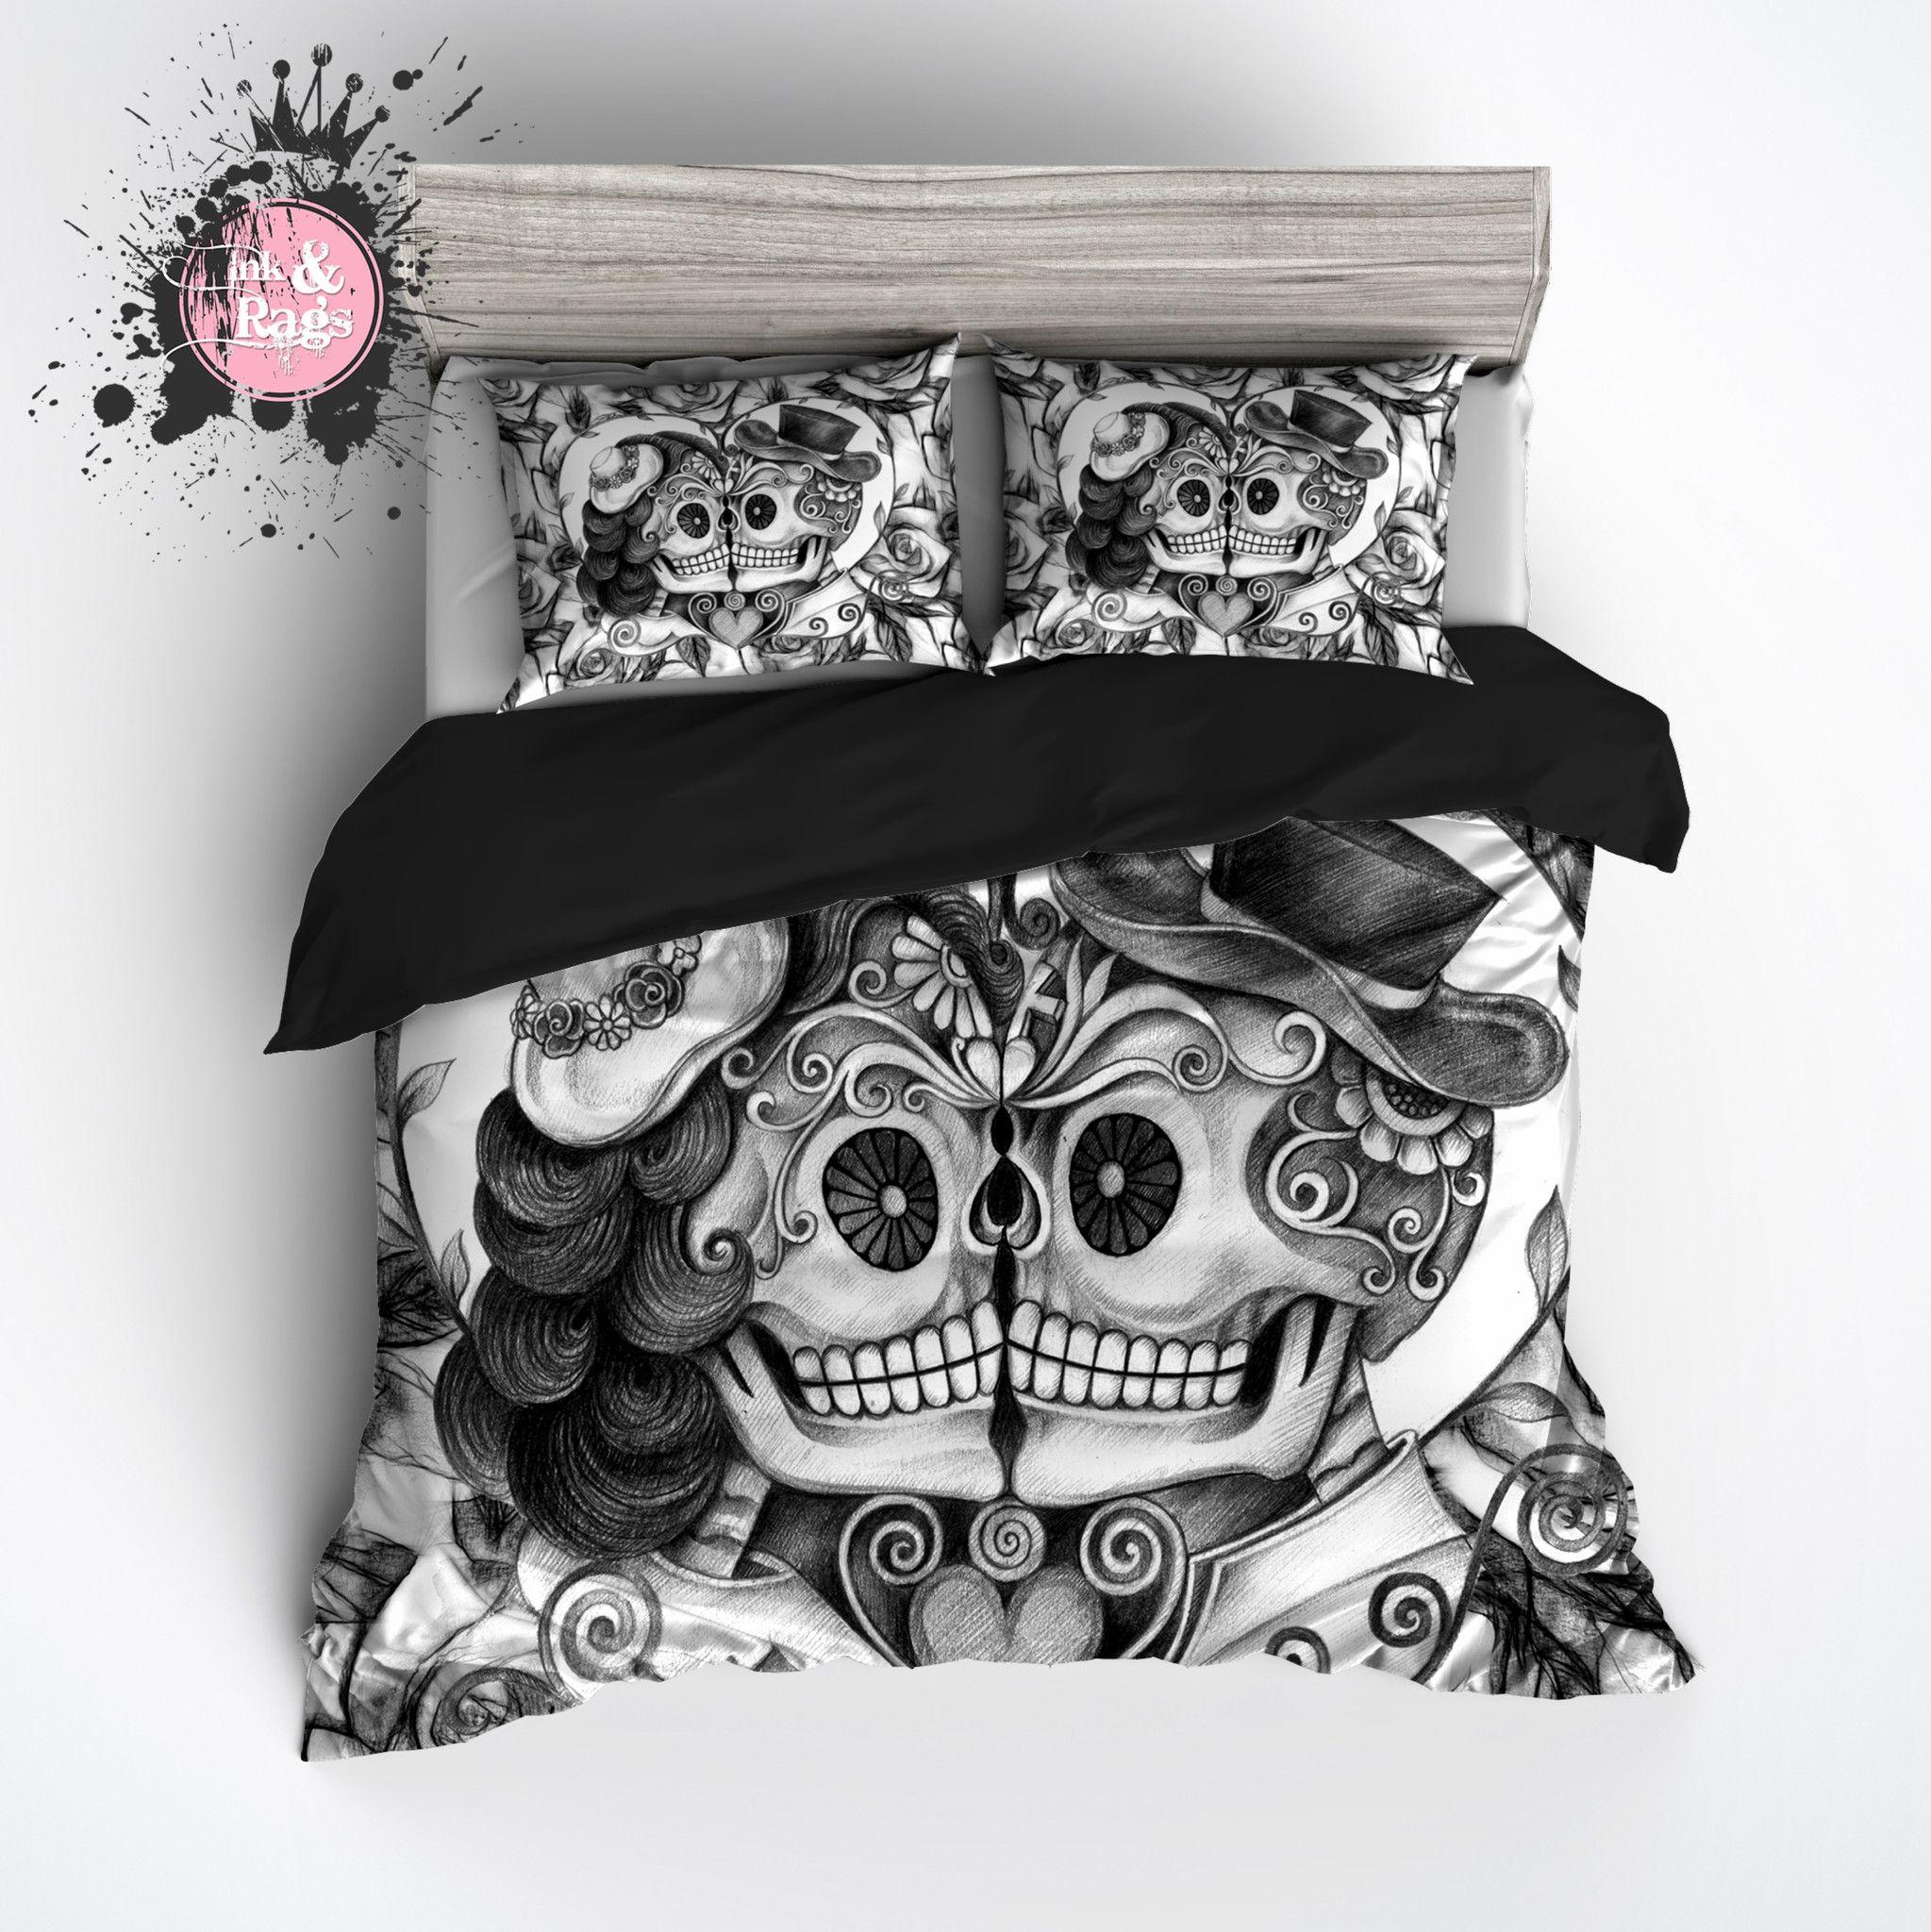 Pencil Sketch Rose Kissing Couple Sugar Skull Bedding